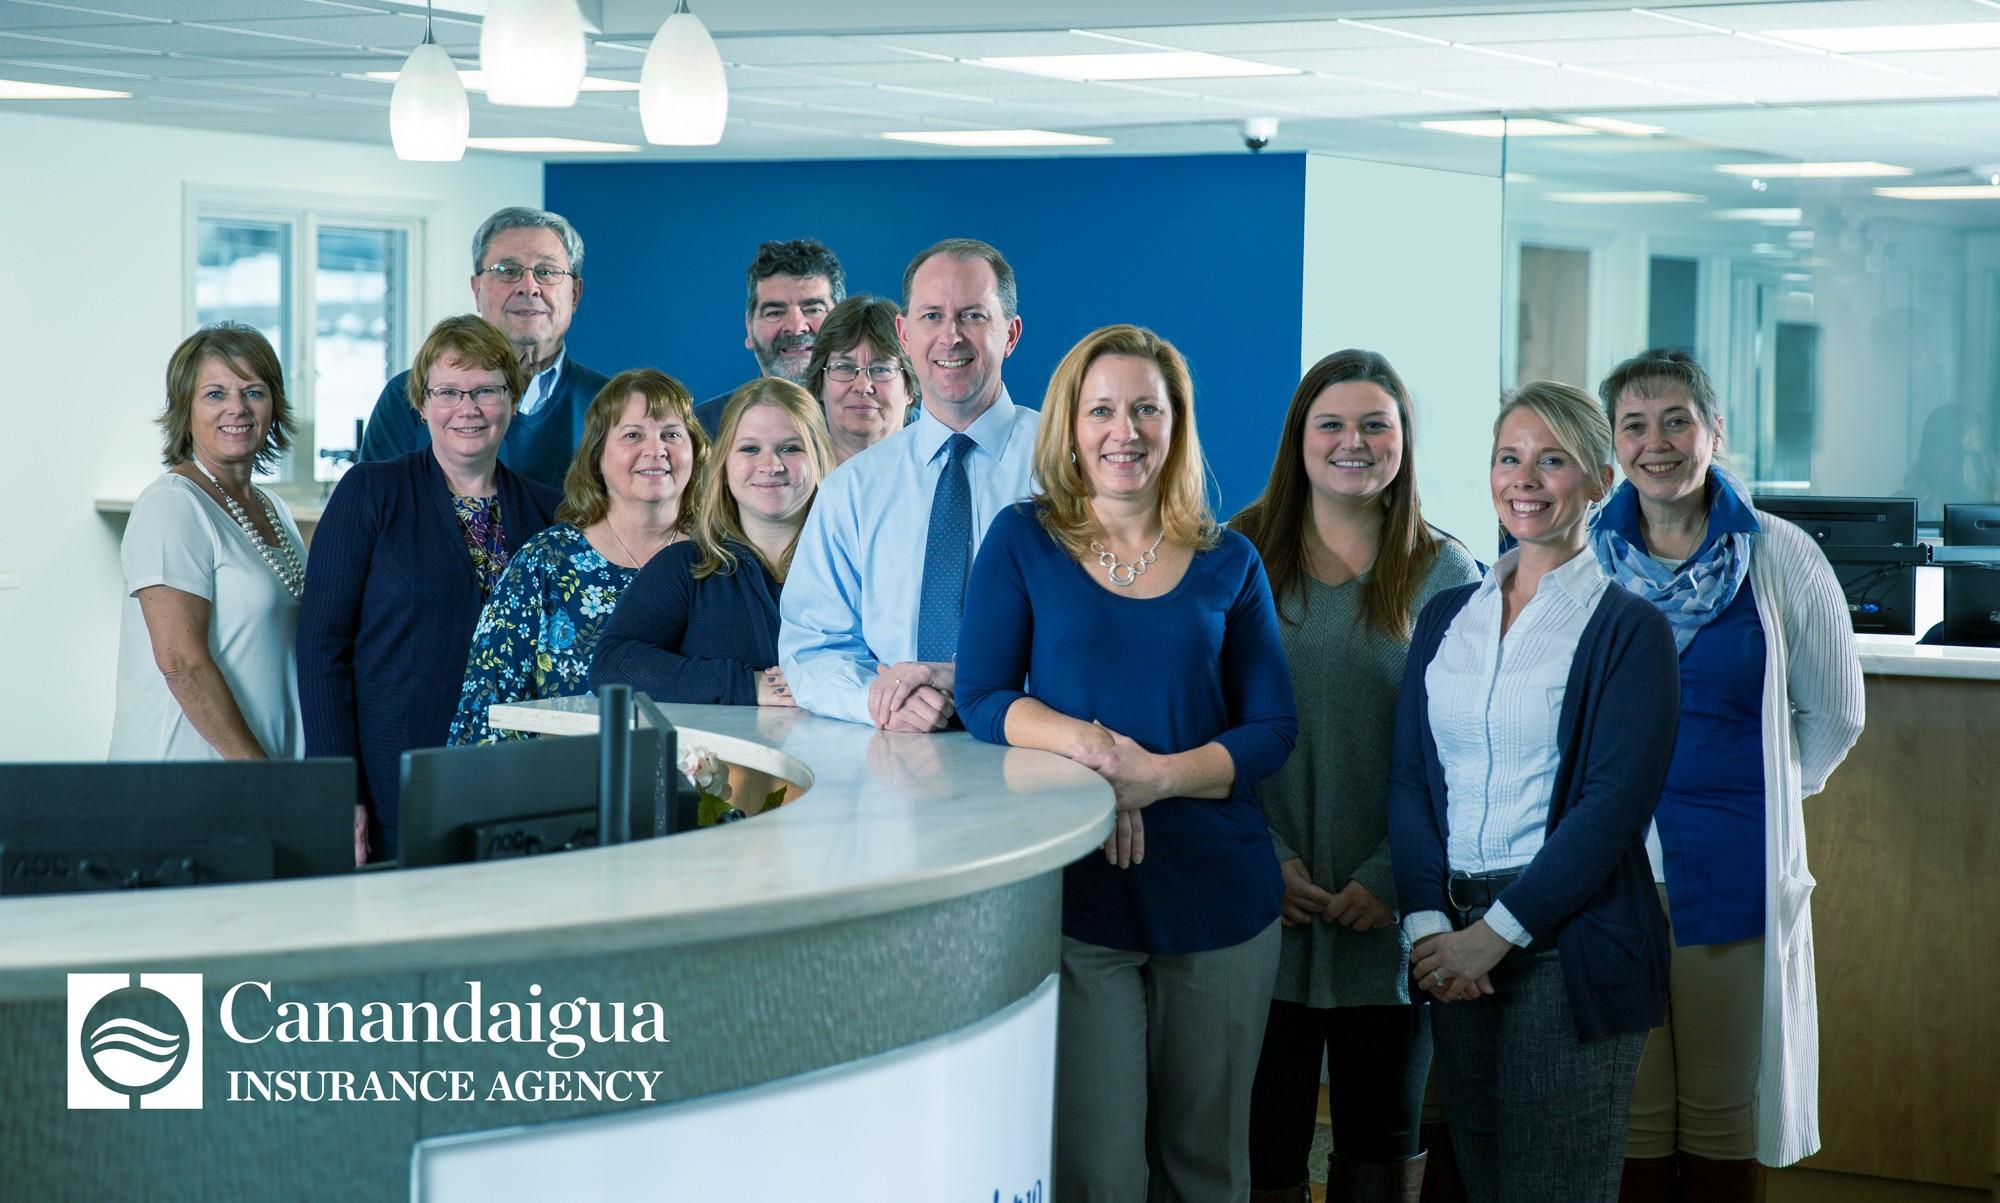 Canandaigua Insurance Agency Linkedin